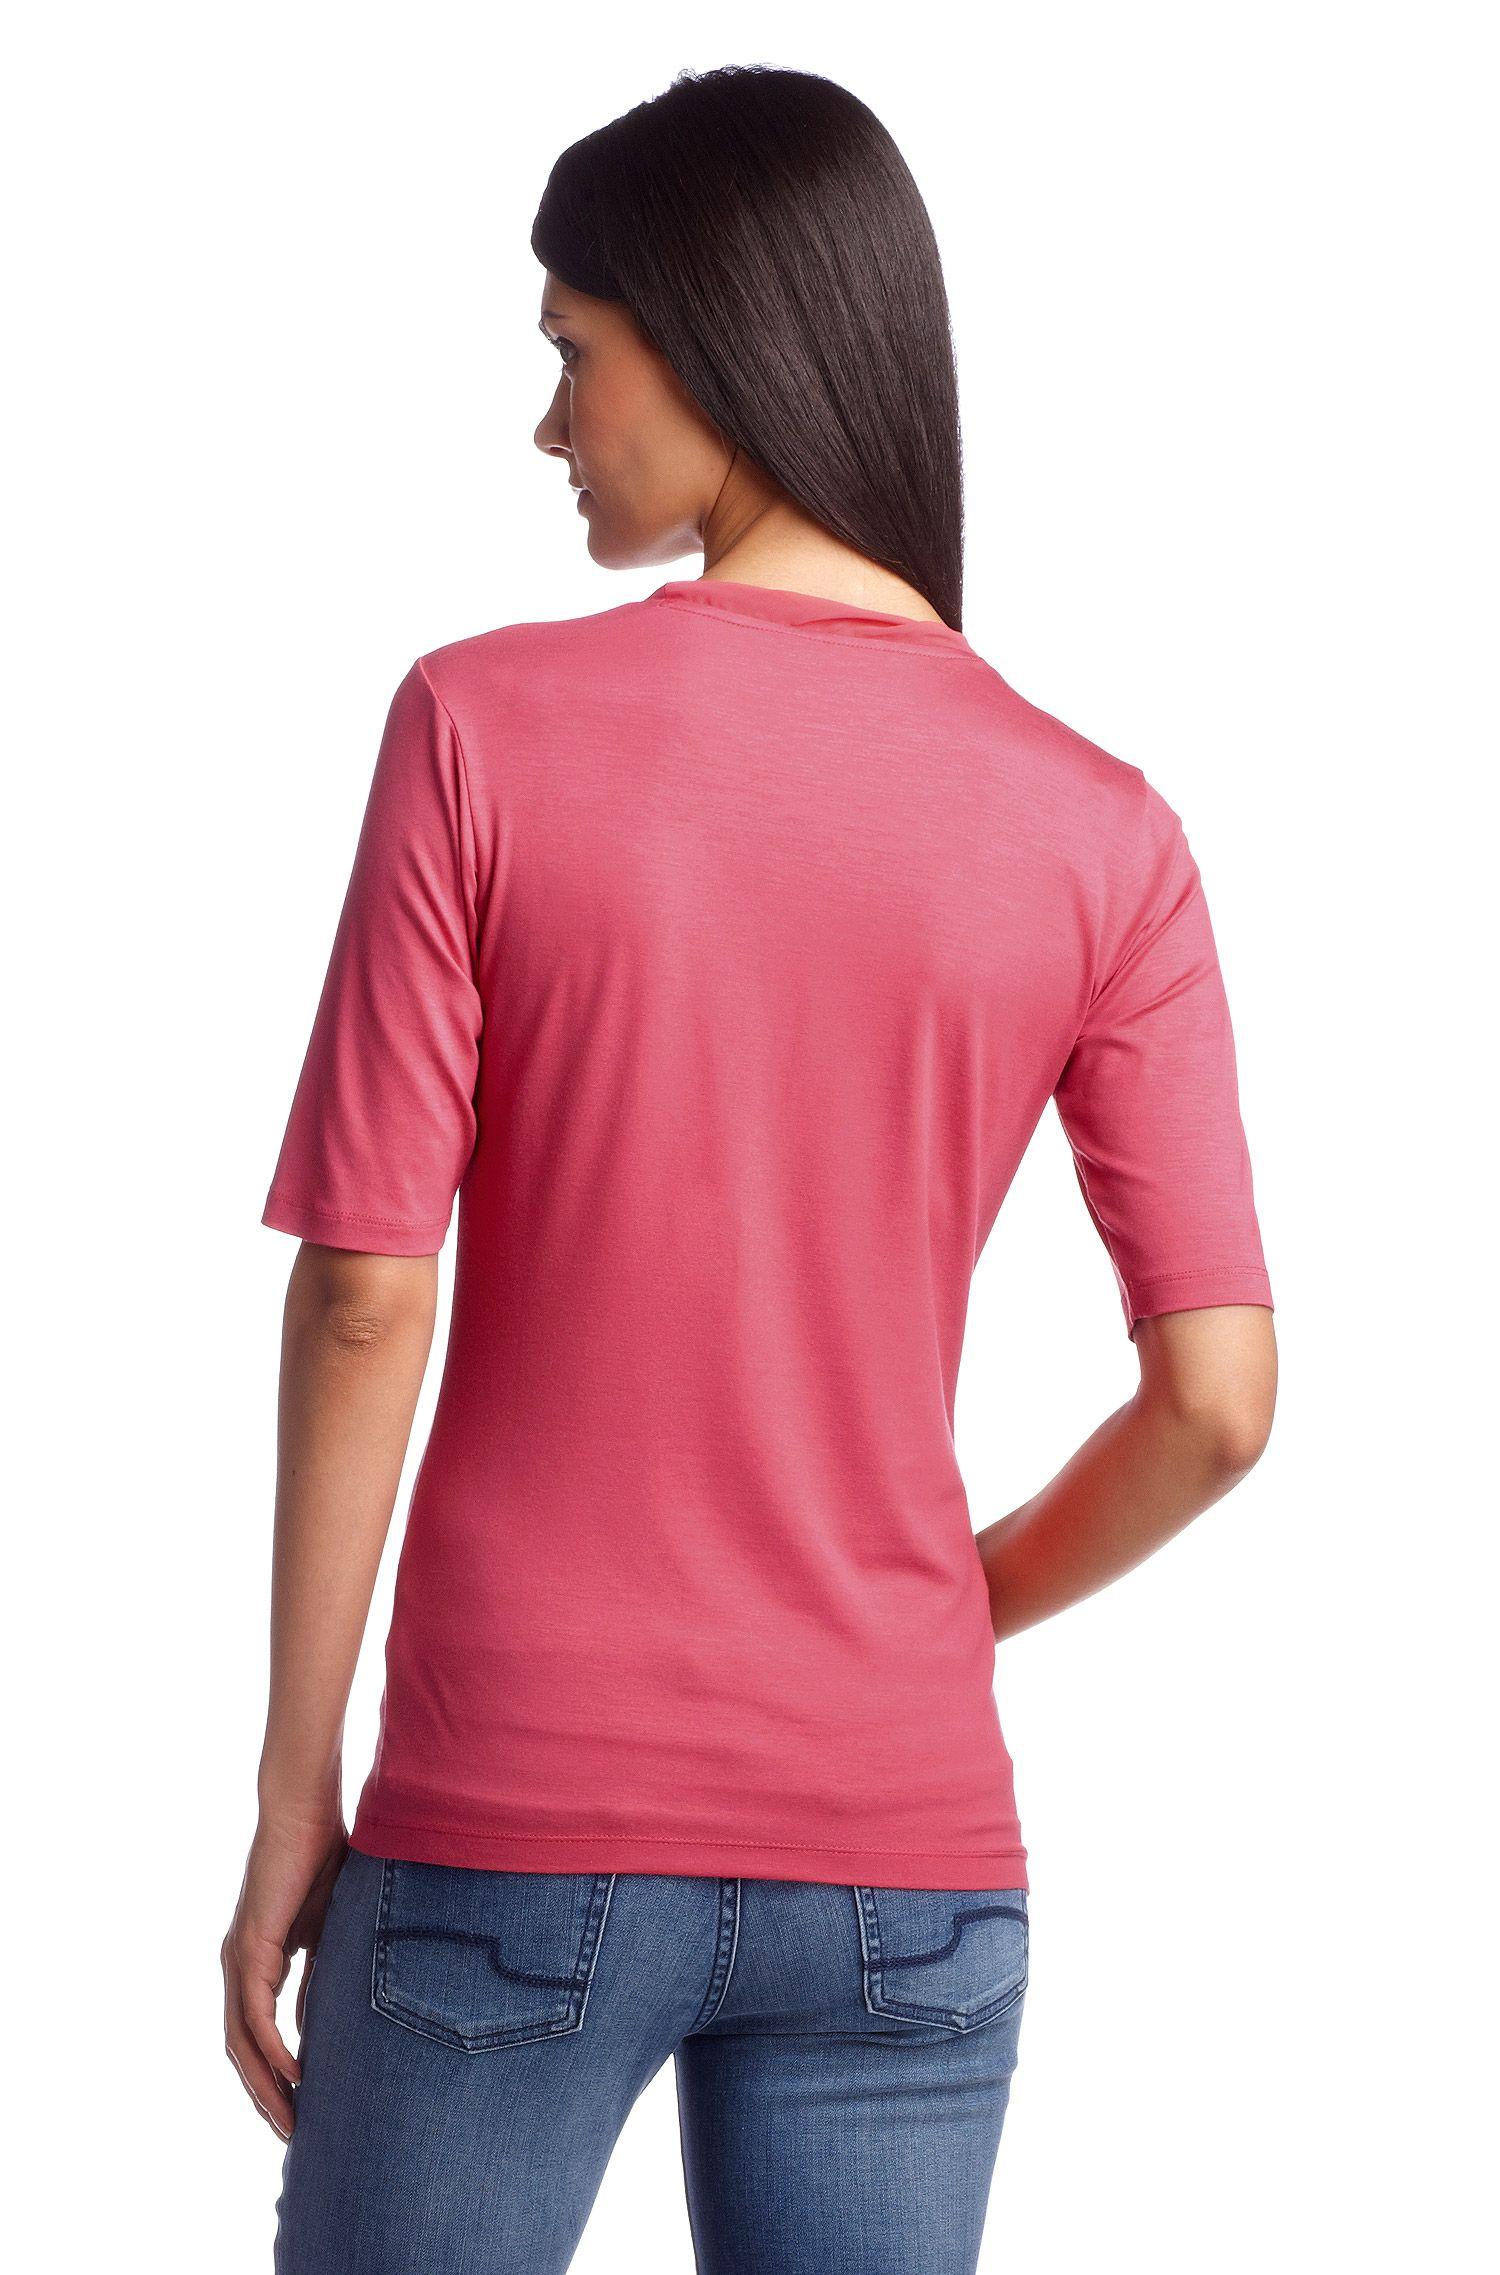 T-Shirt ´E4637` mit halbem Ärmel